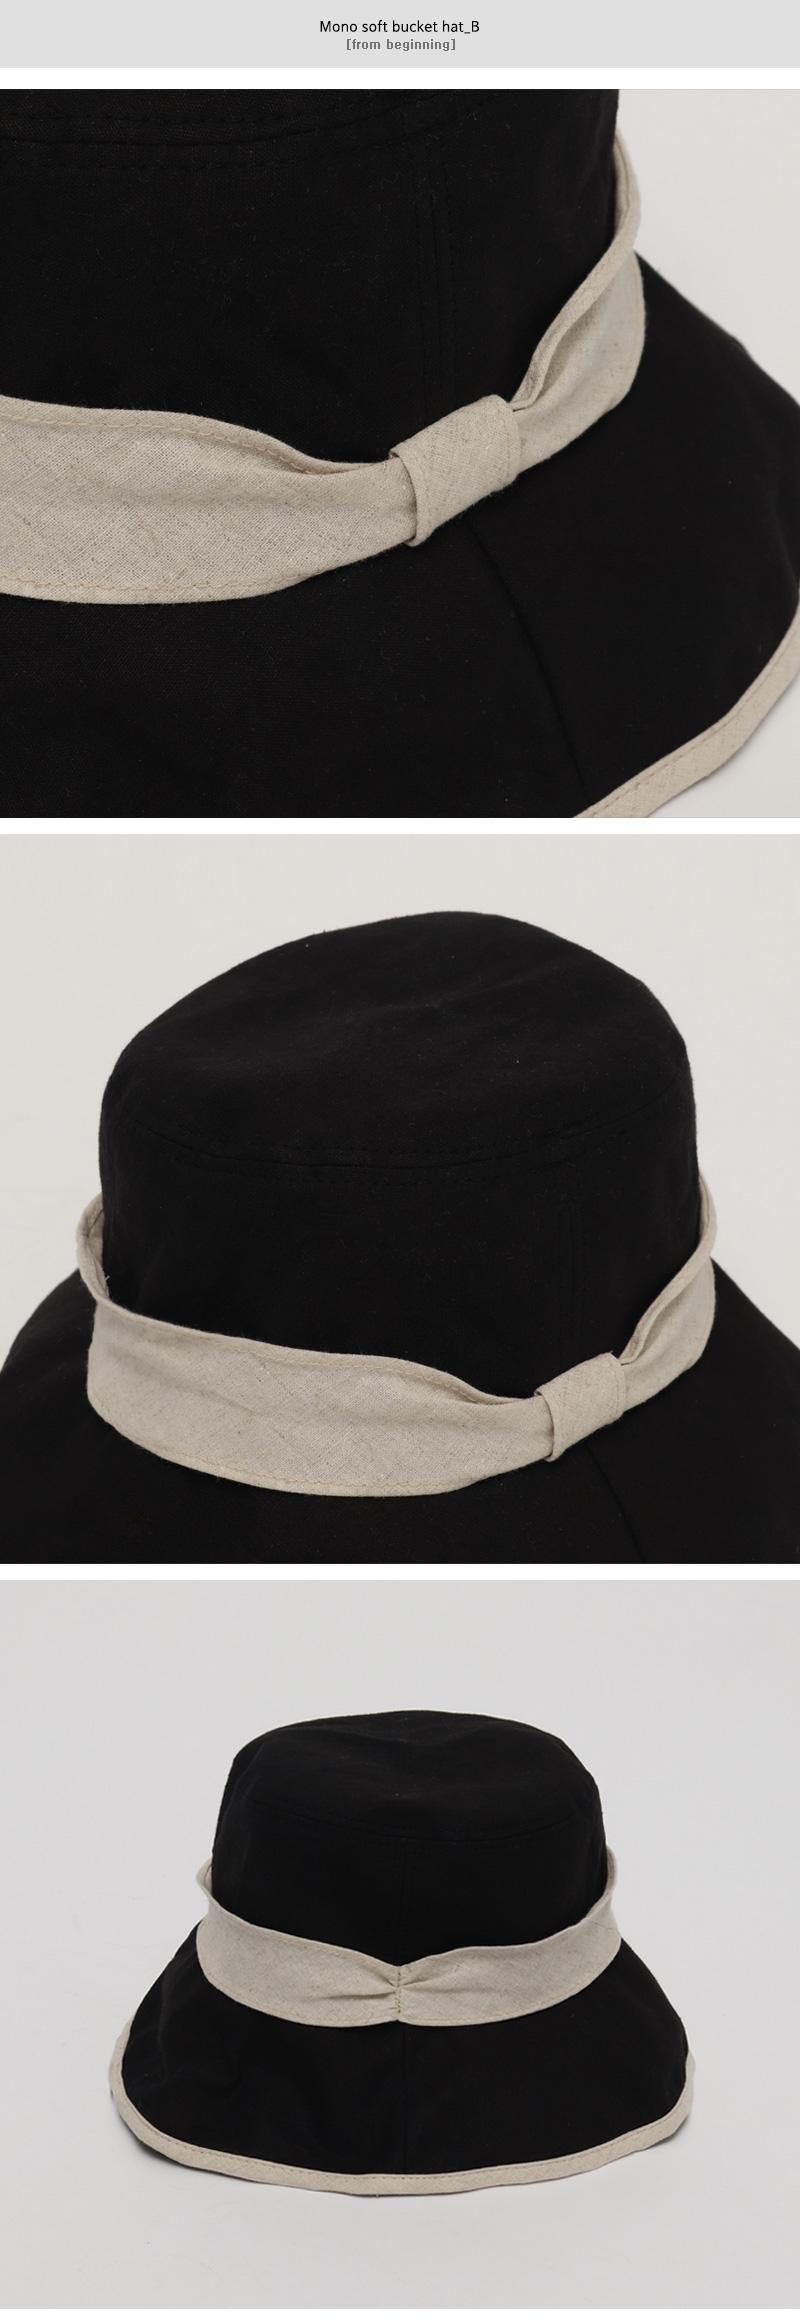 Mono soft bucket hat_B